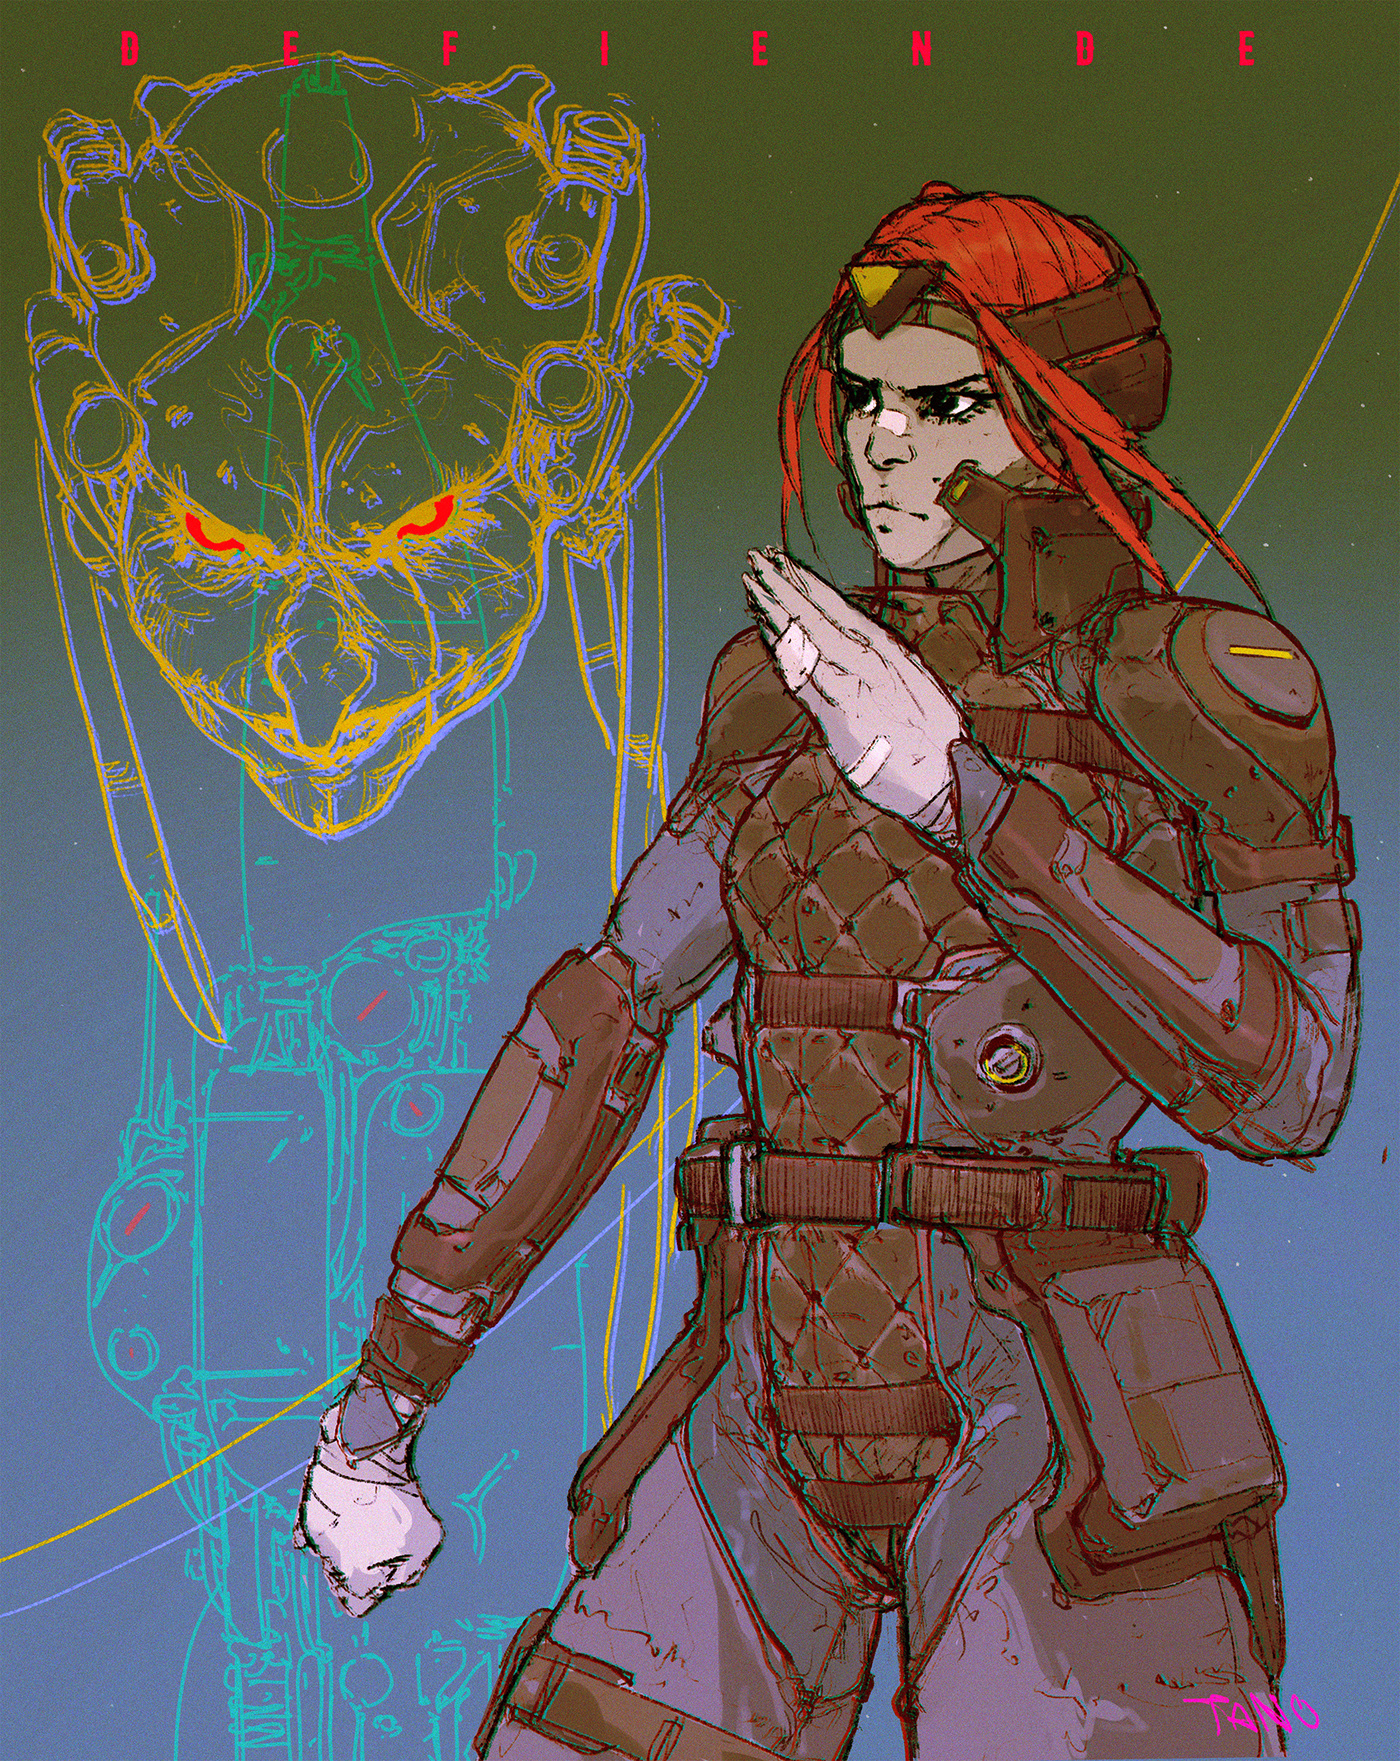 Cyberpunk fantasy tanobonfanti